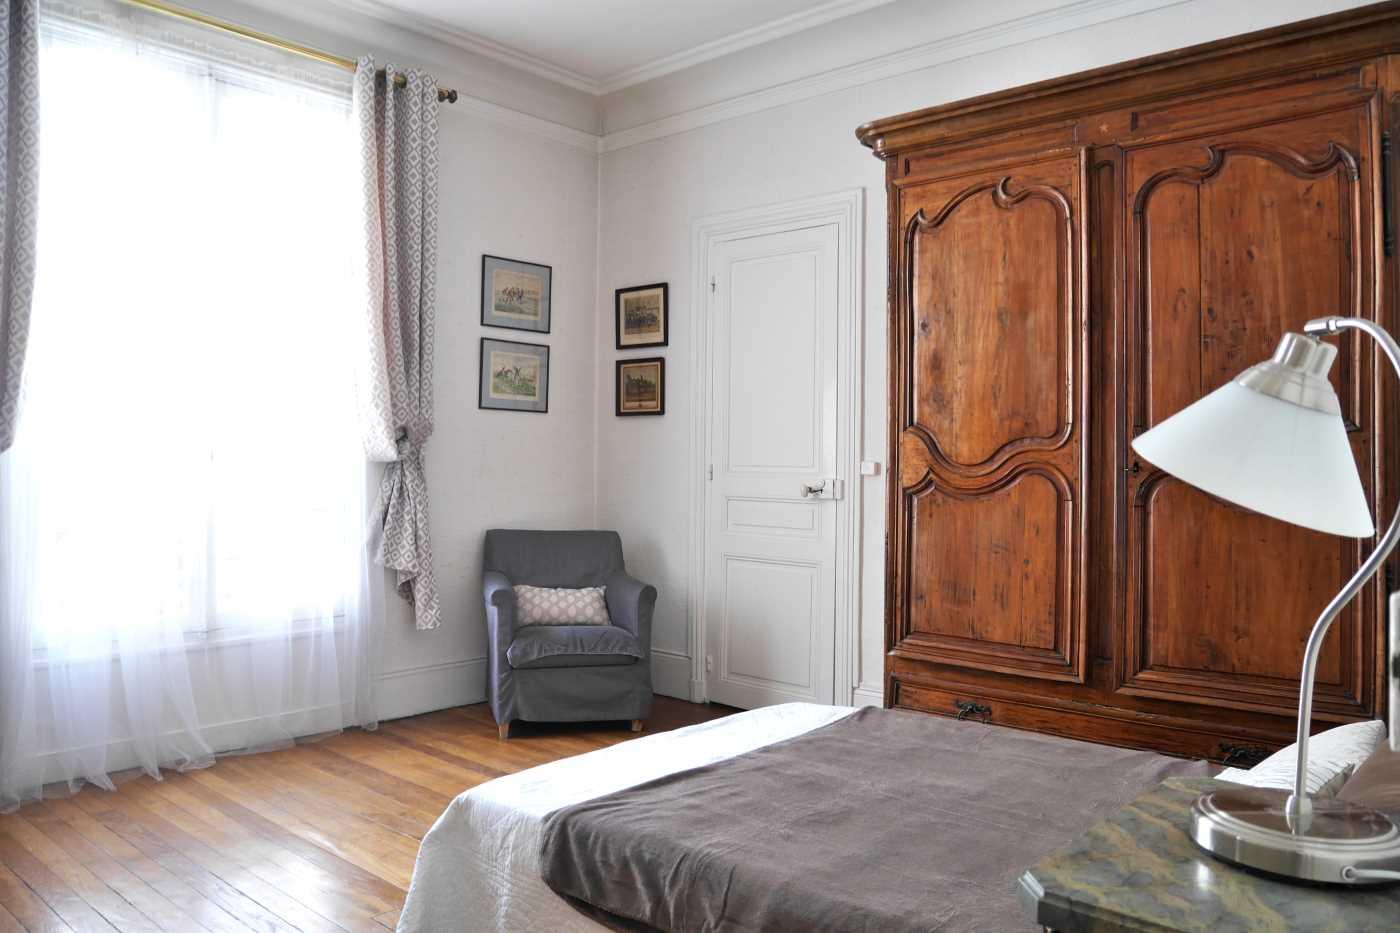 location appartement meubl paris 16 cattalan johnson immobilier. Black Bedroom Furniture Sets. Home Design Ideas